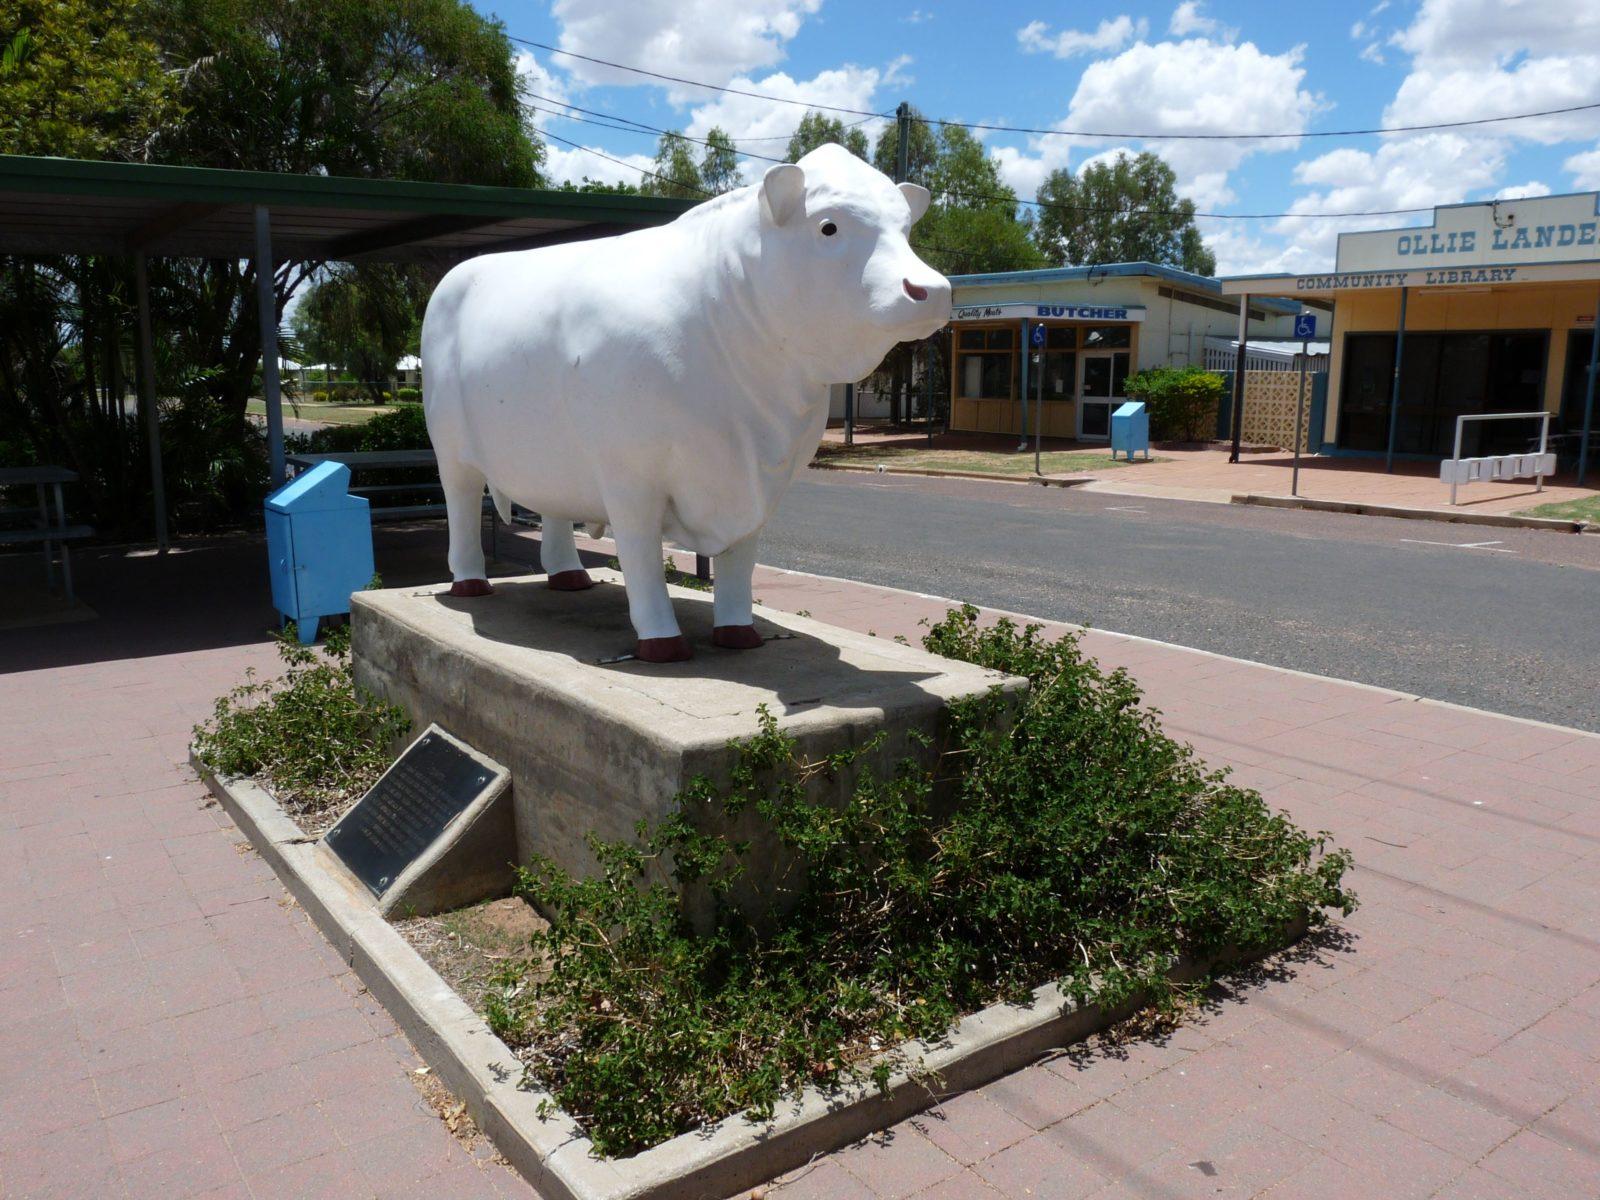 Aramac - The White Bull